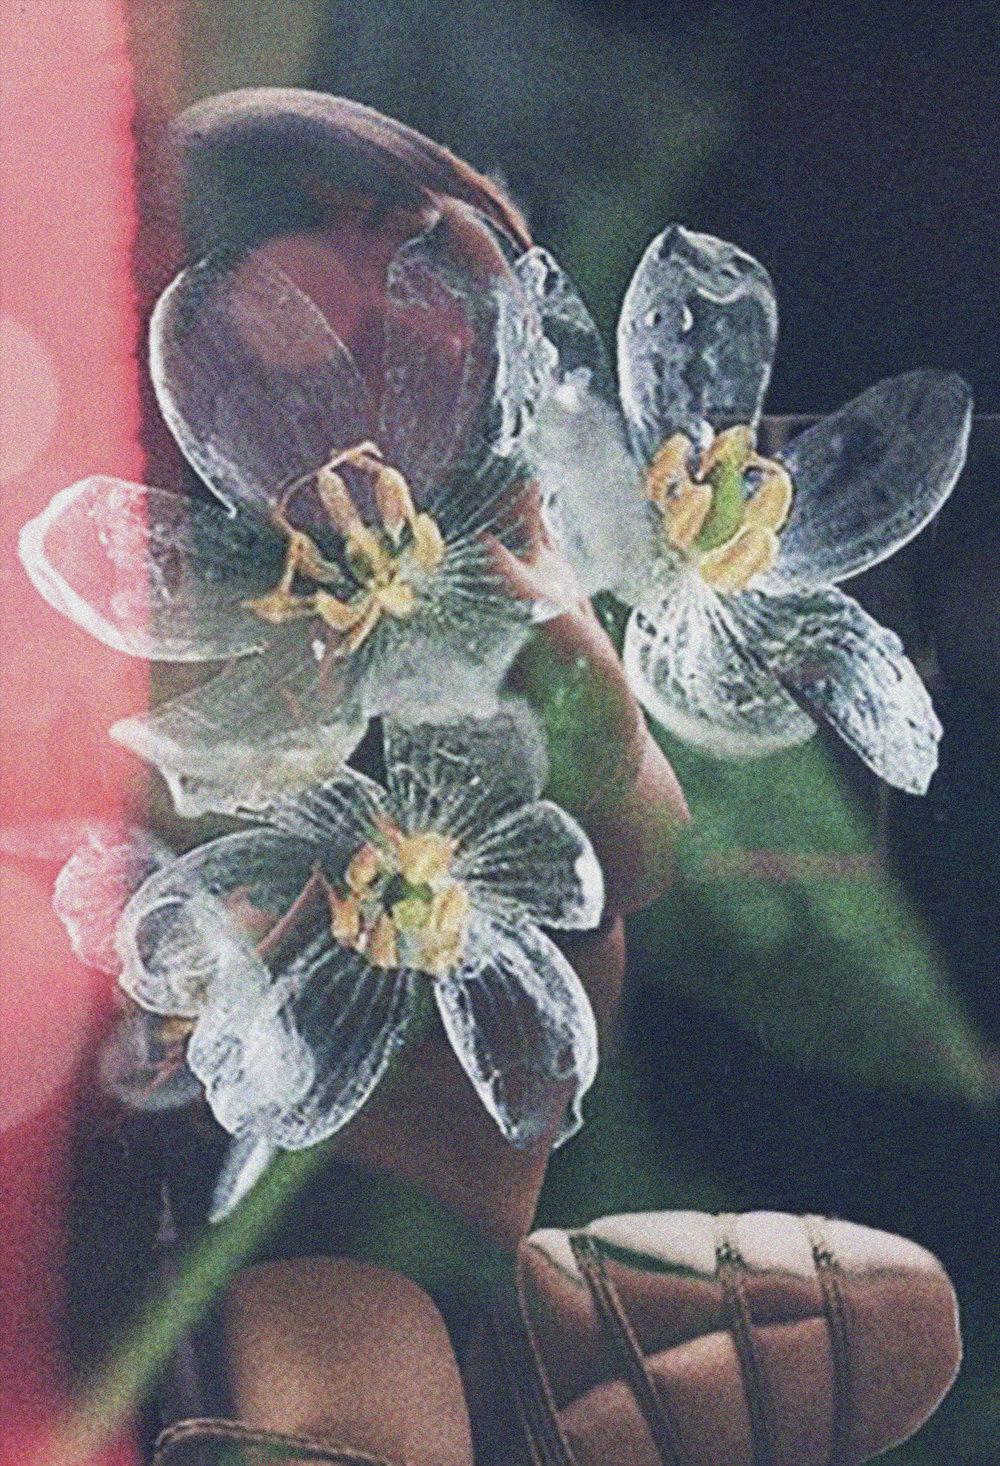 autumnelizabethclarktransparentflowers.jpg